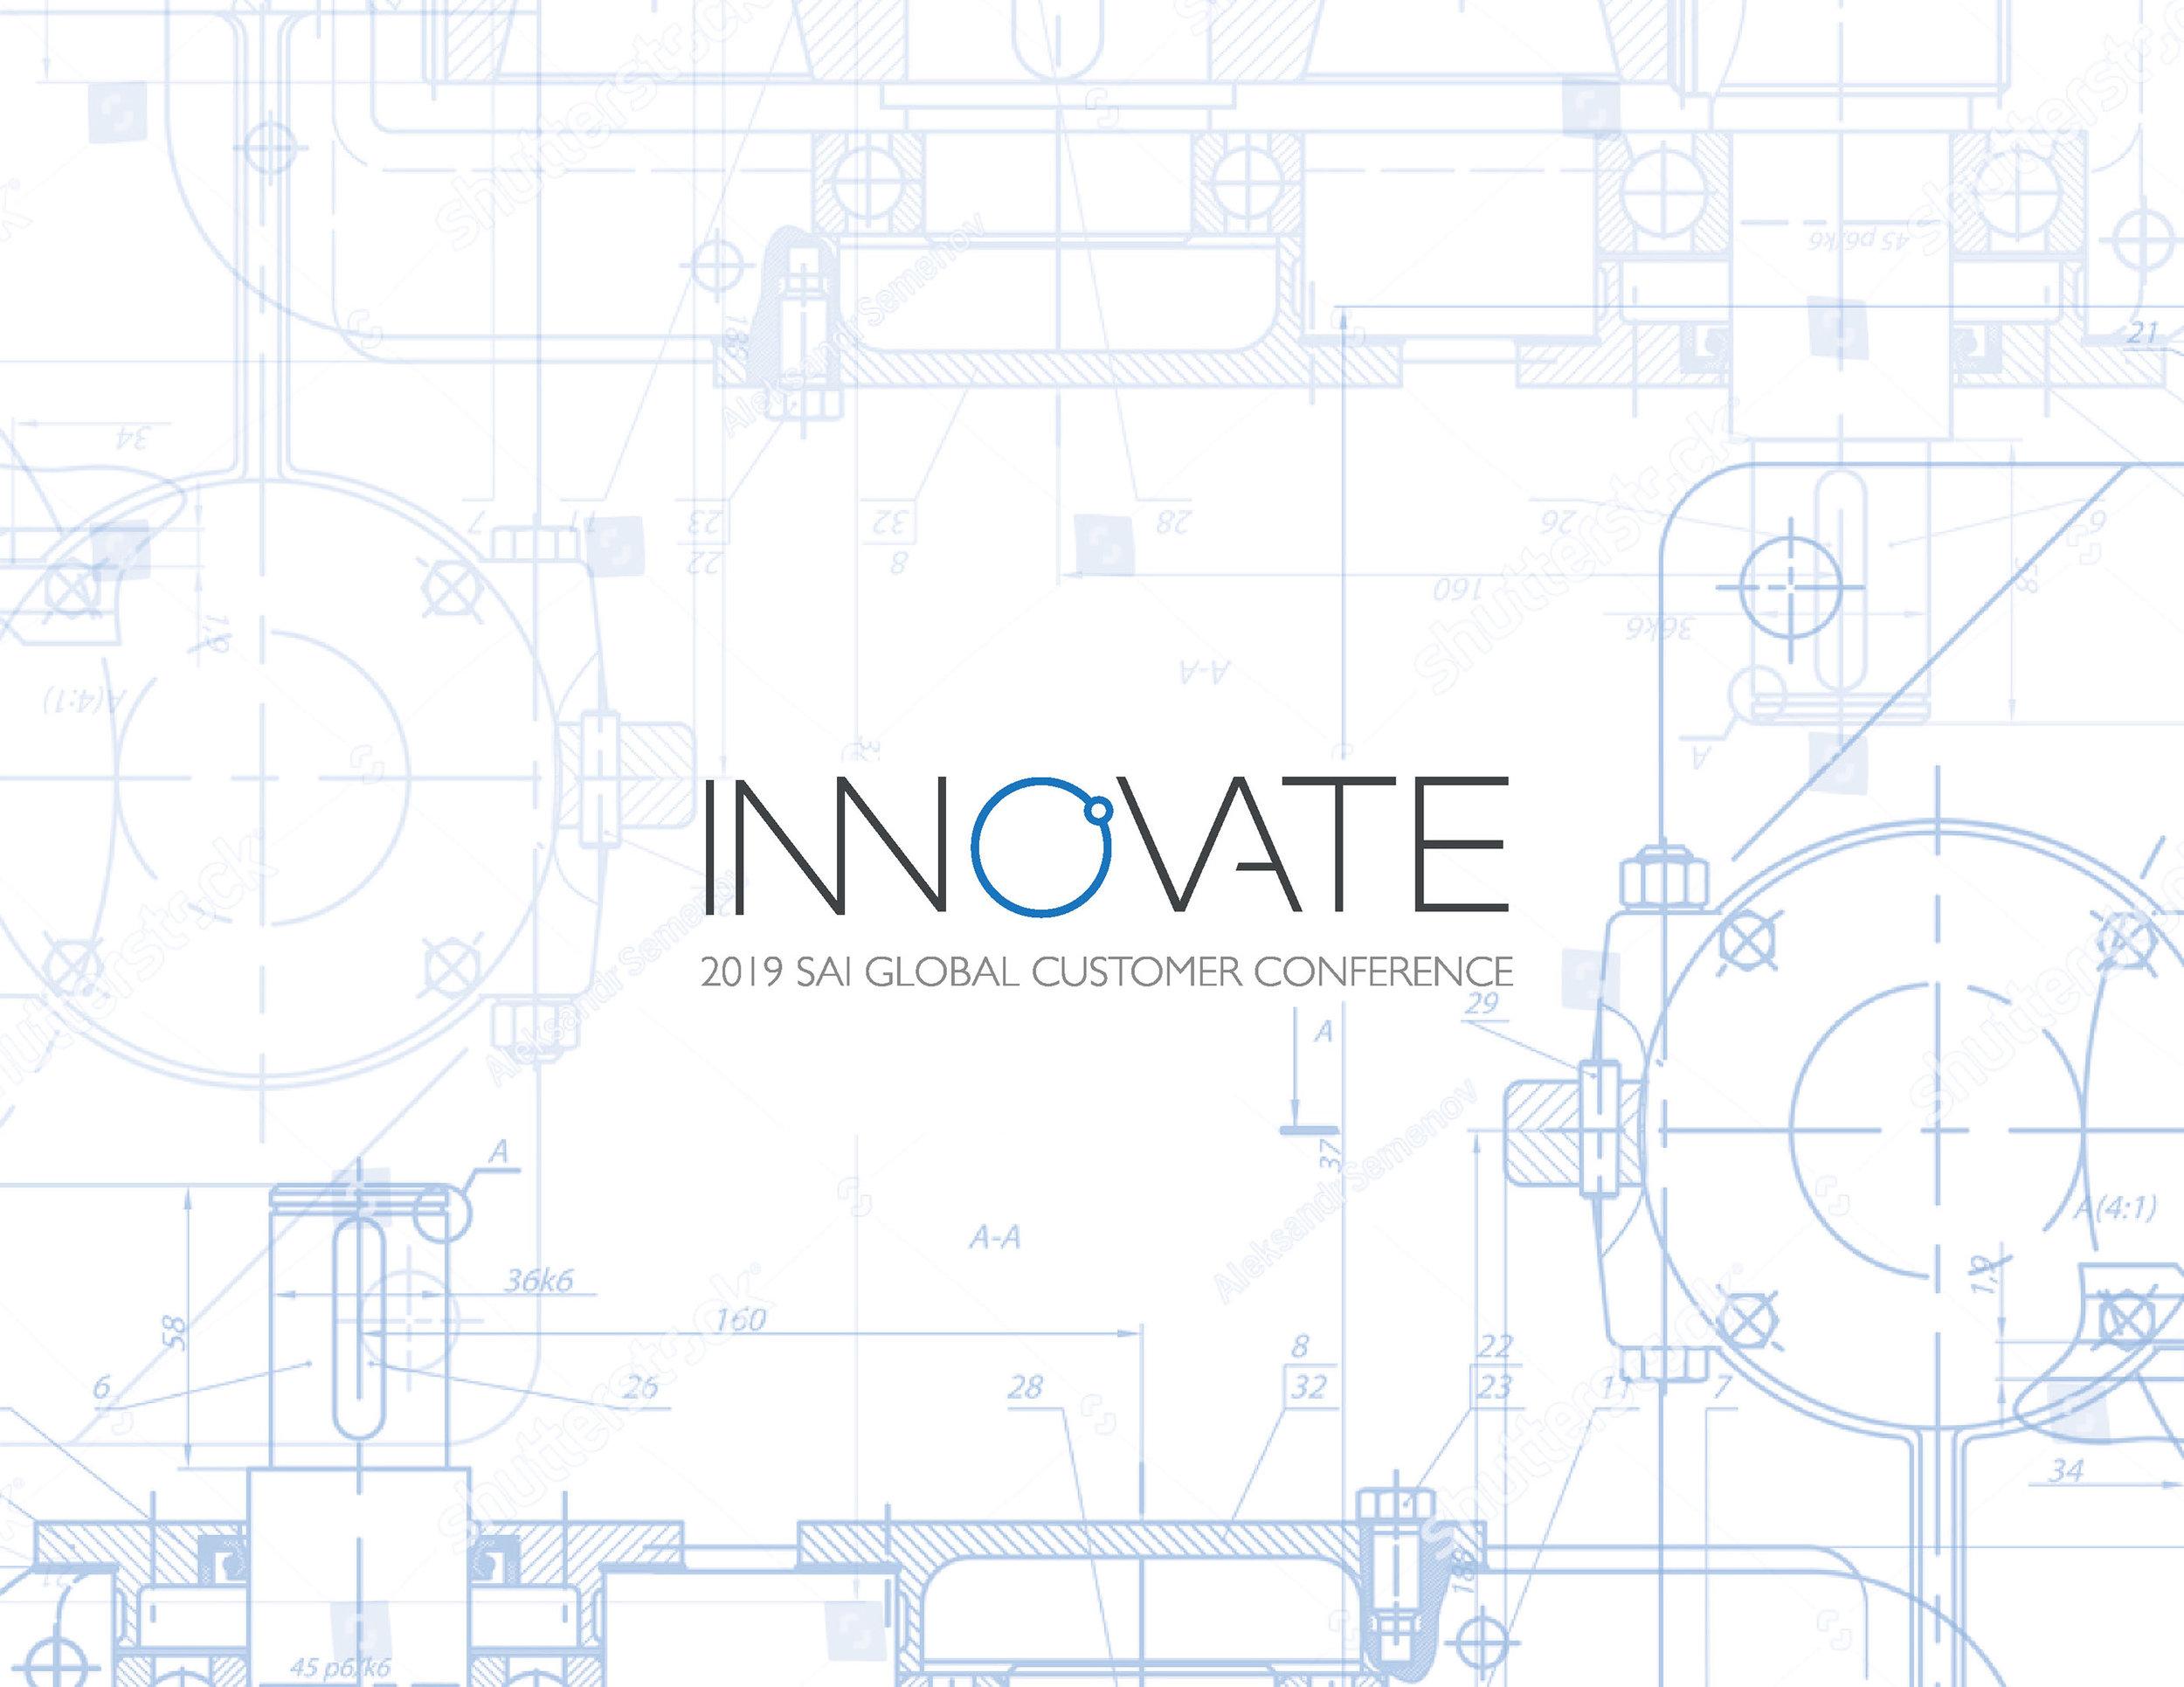 Innovate SAI Global Customer Conference 2019